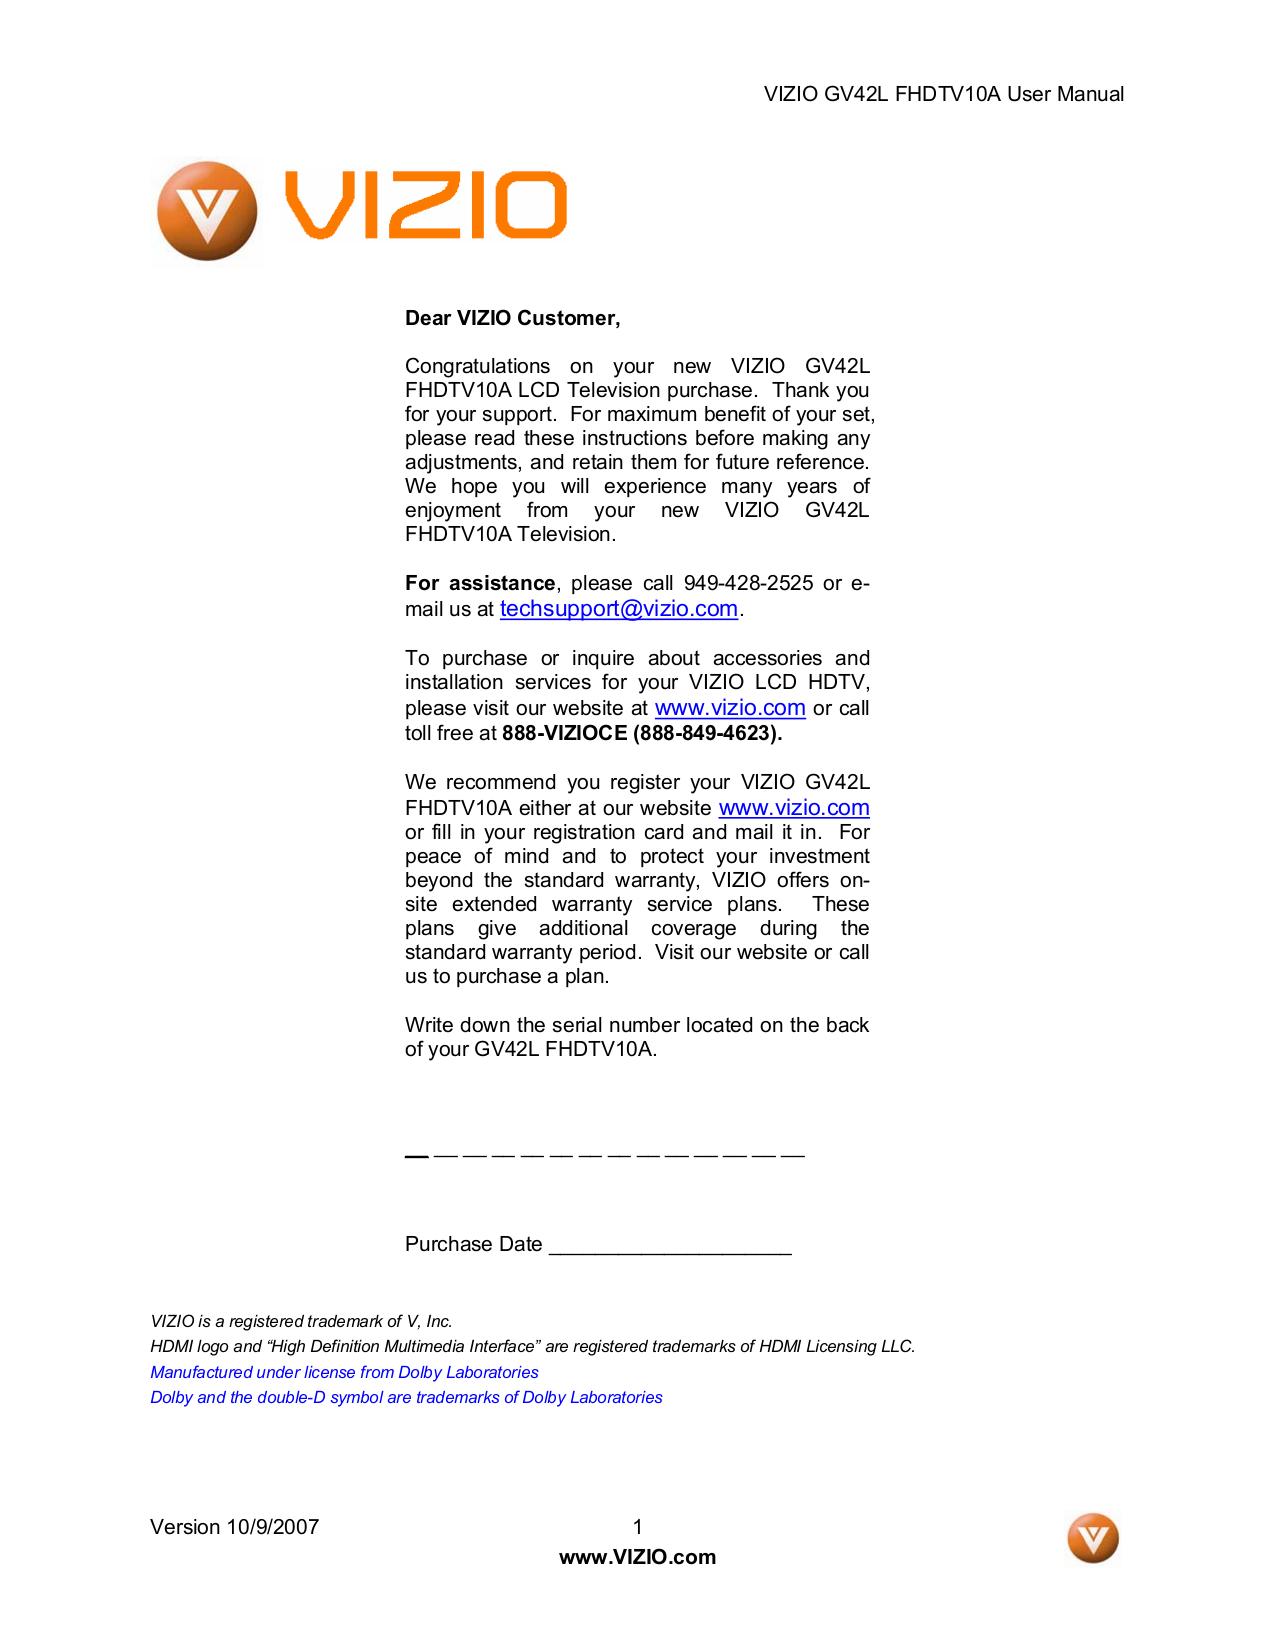 pdf for Vizio TV GV42L manual